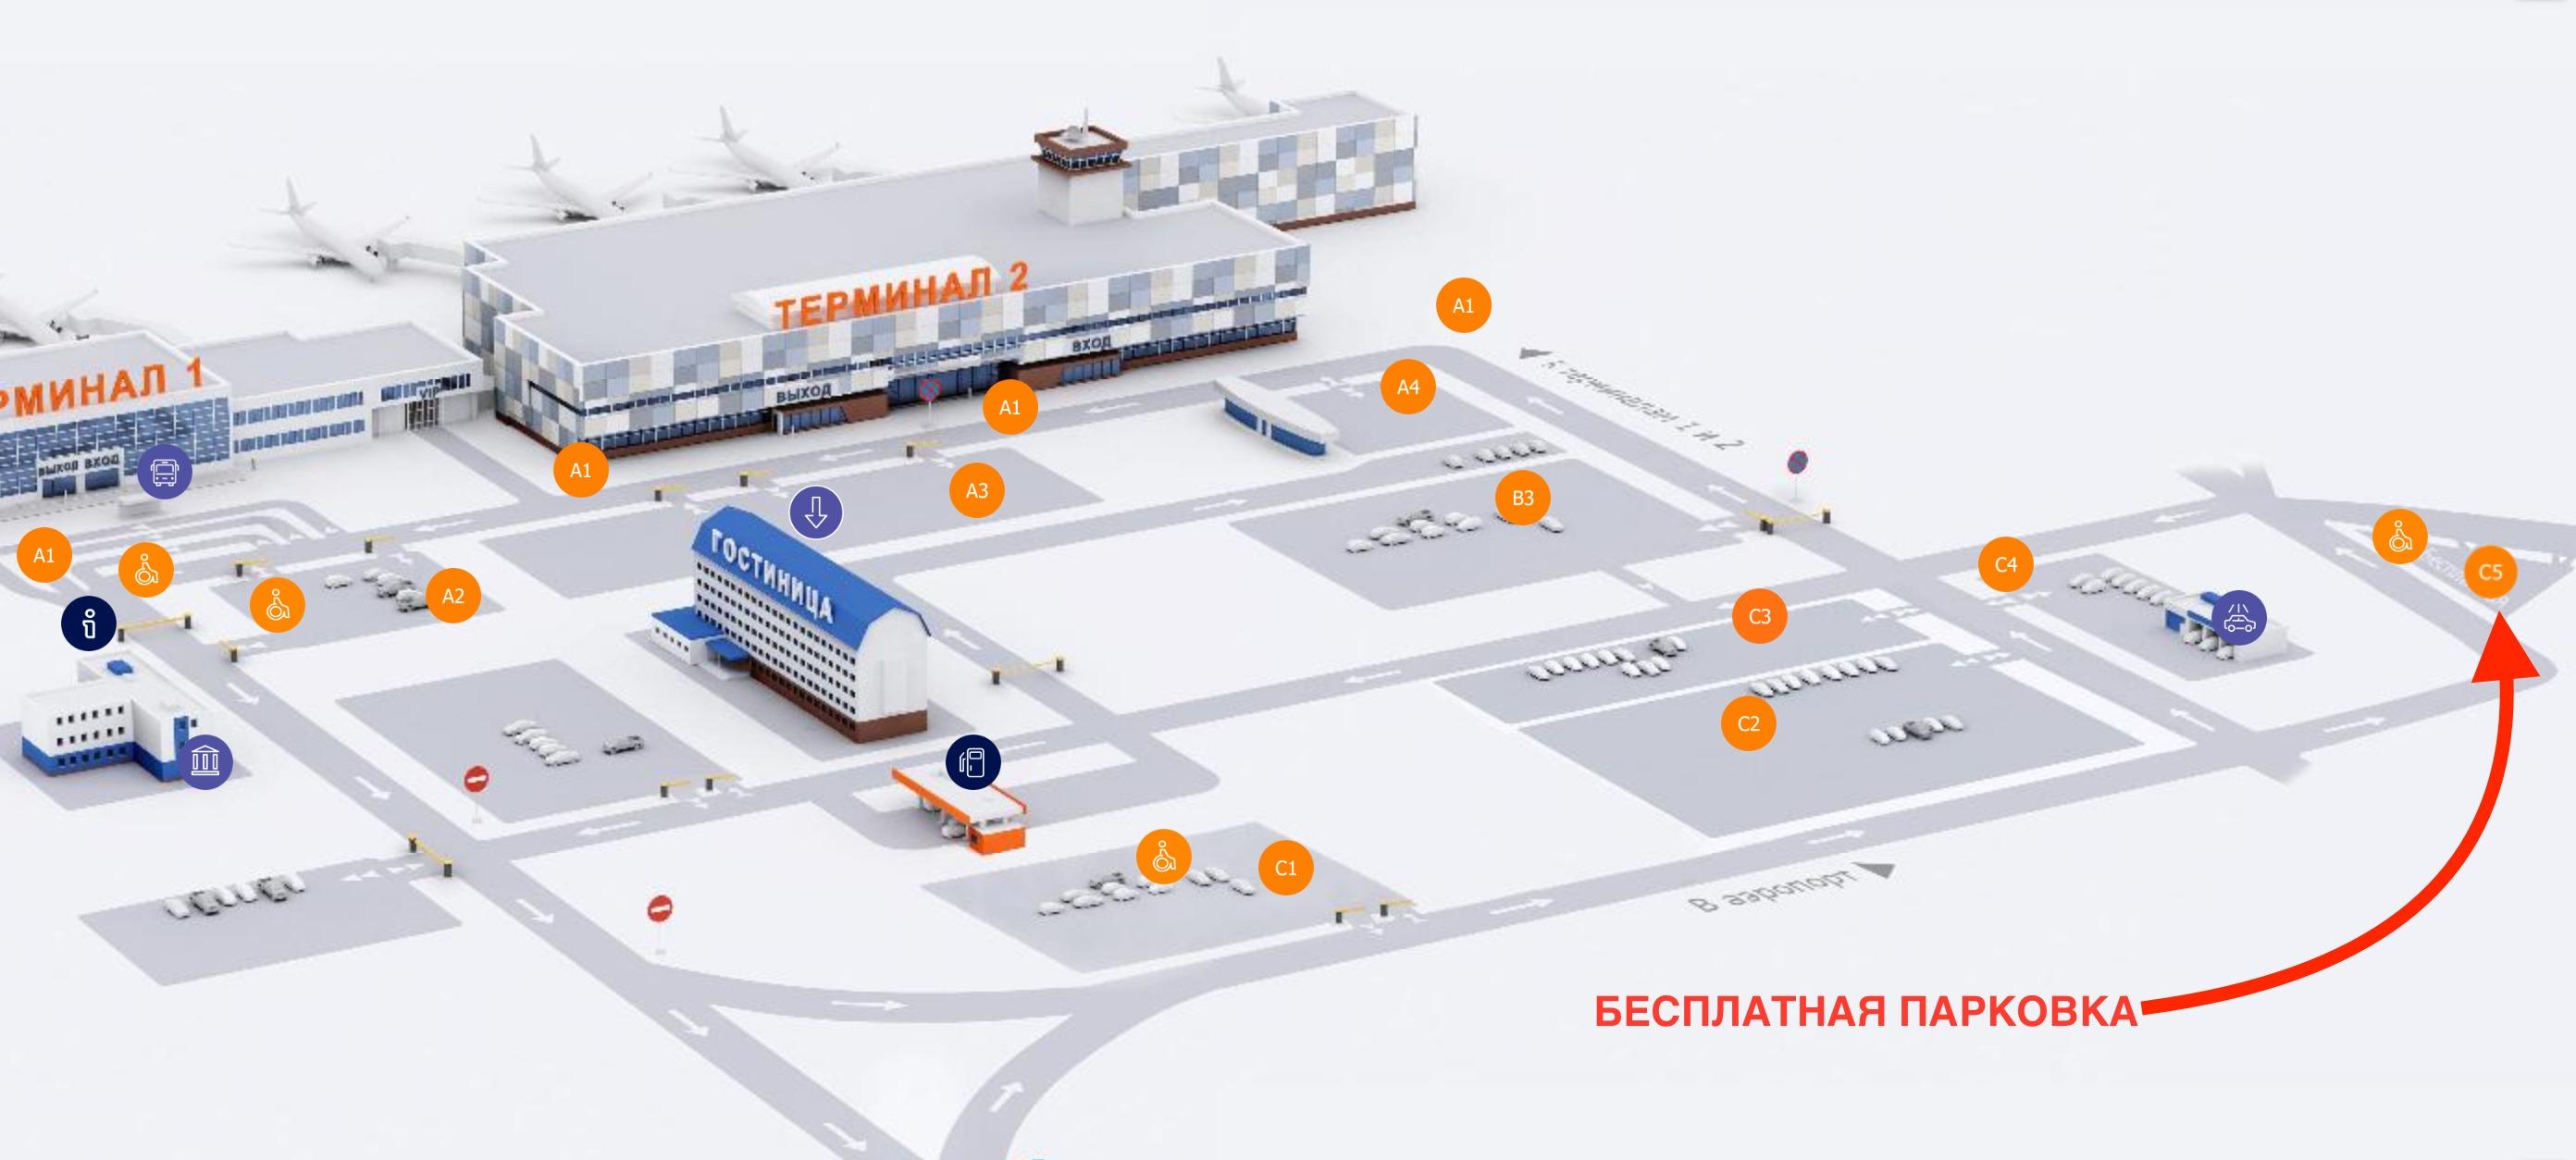 Схема парковок в аэропорту Уфа